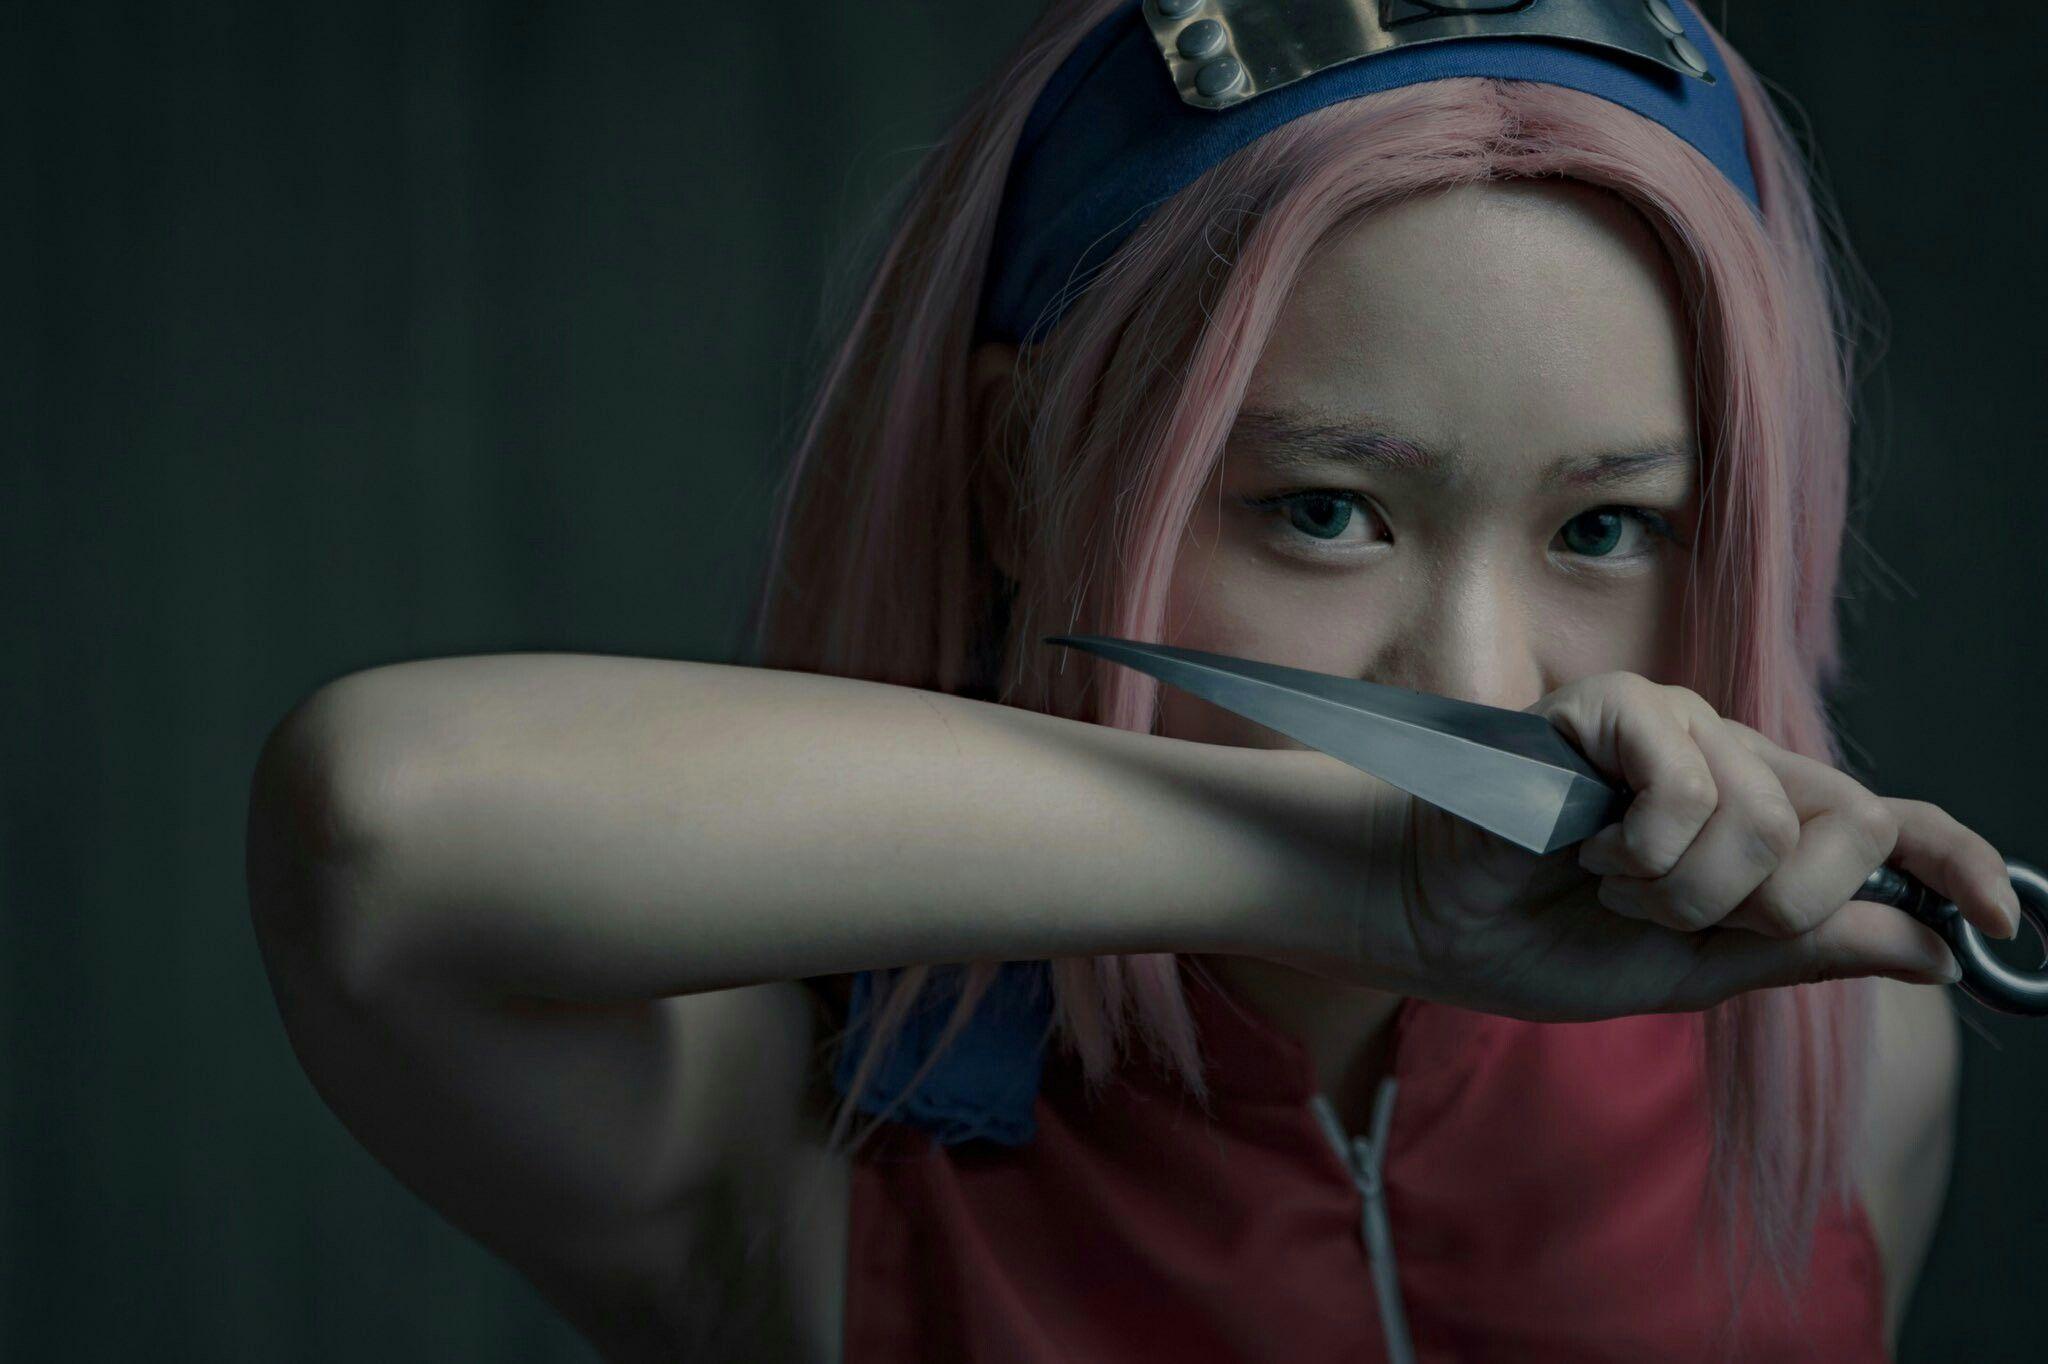 Pin oleh HimeQu di Kunoichi♡Qu cosplay art